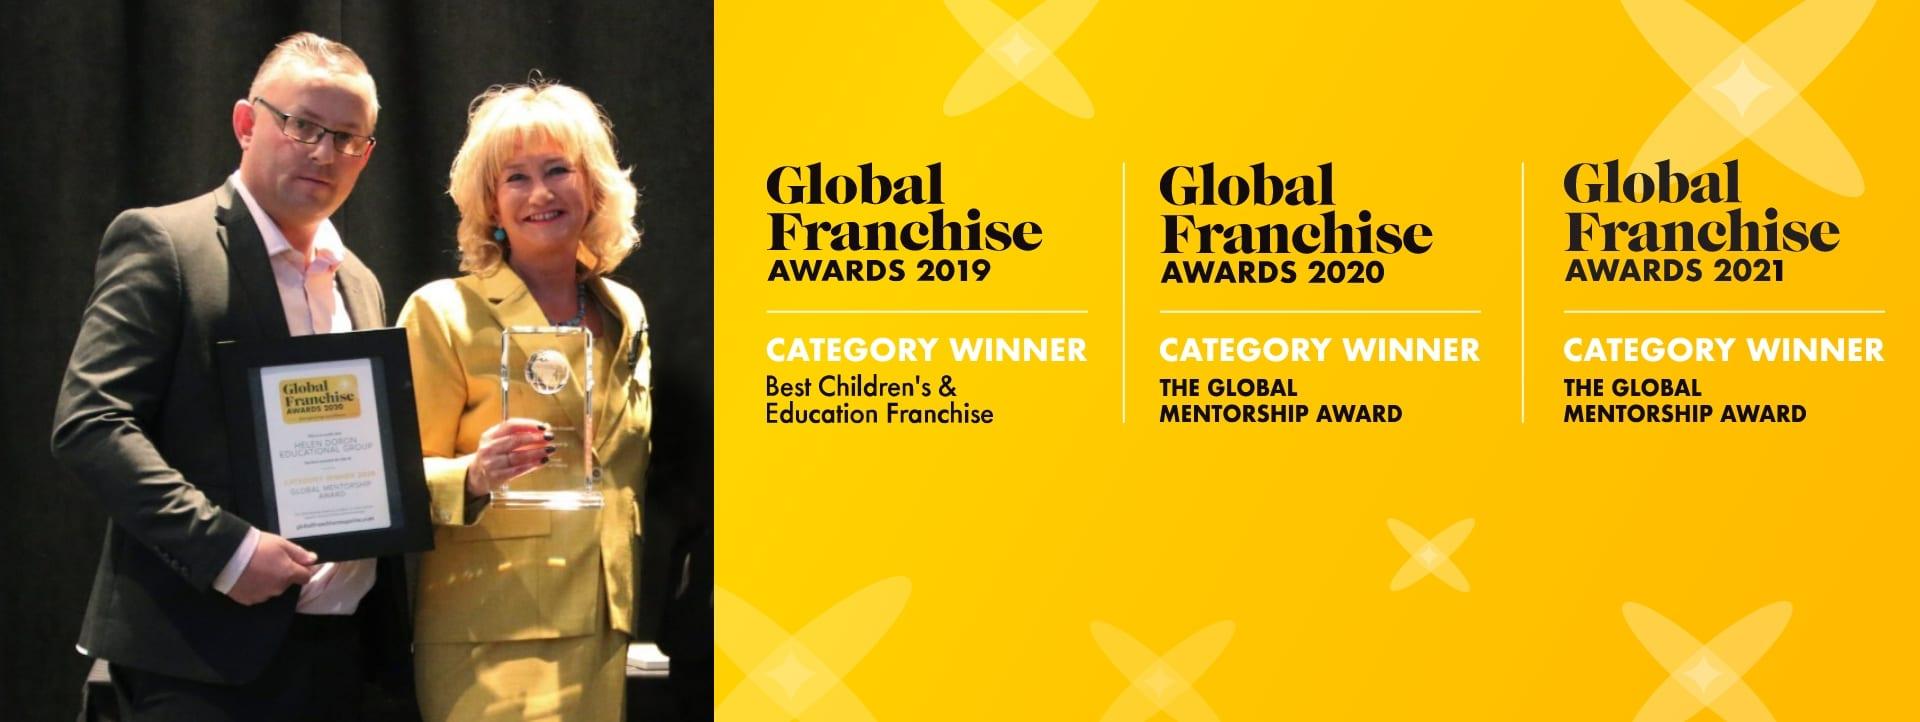 Global Franchise Award 2019-2021